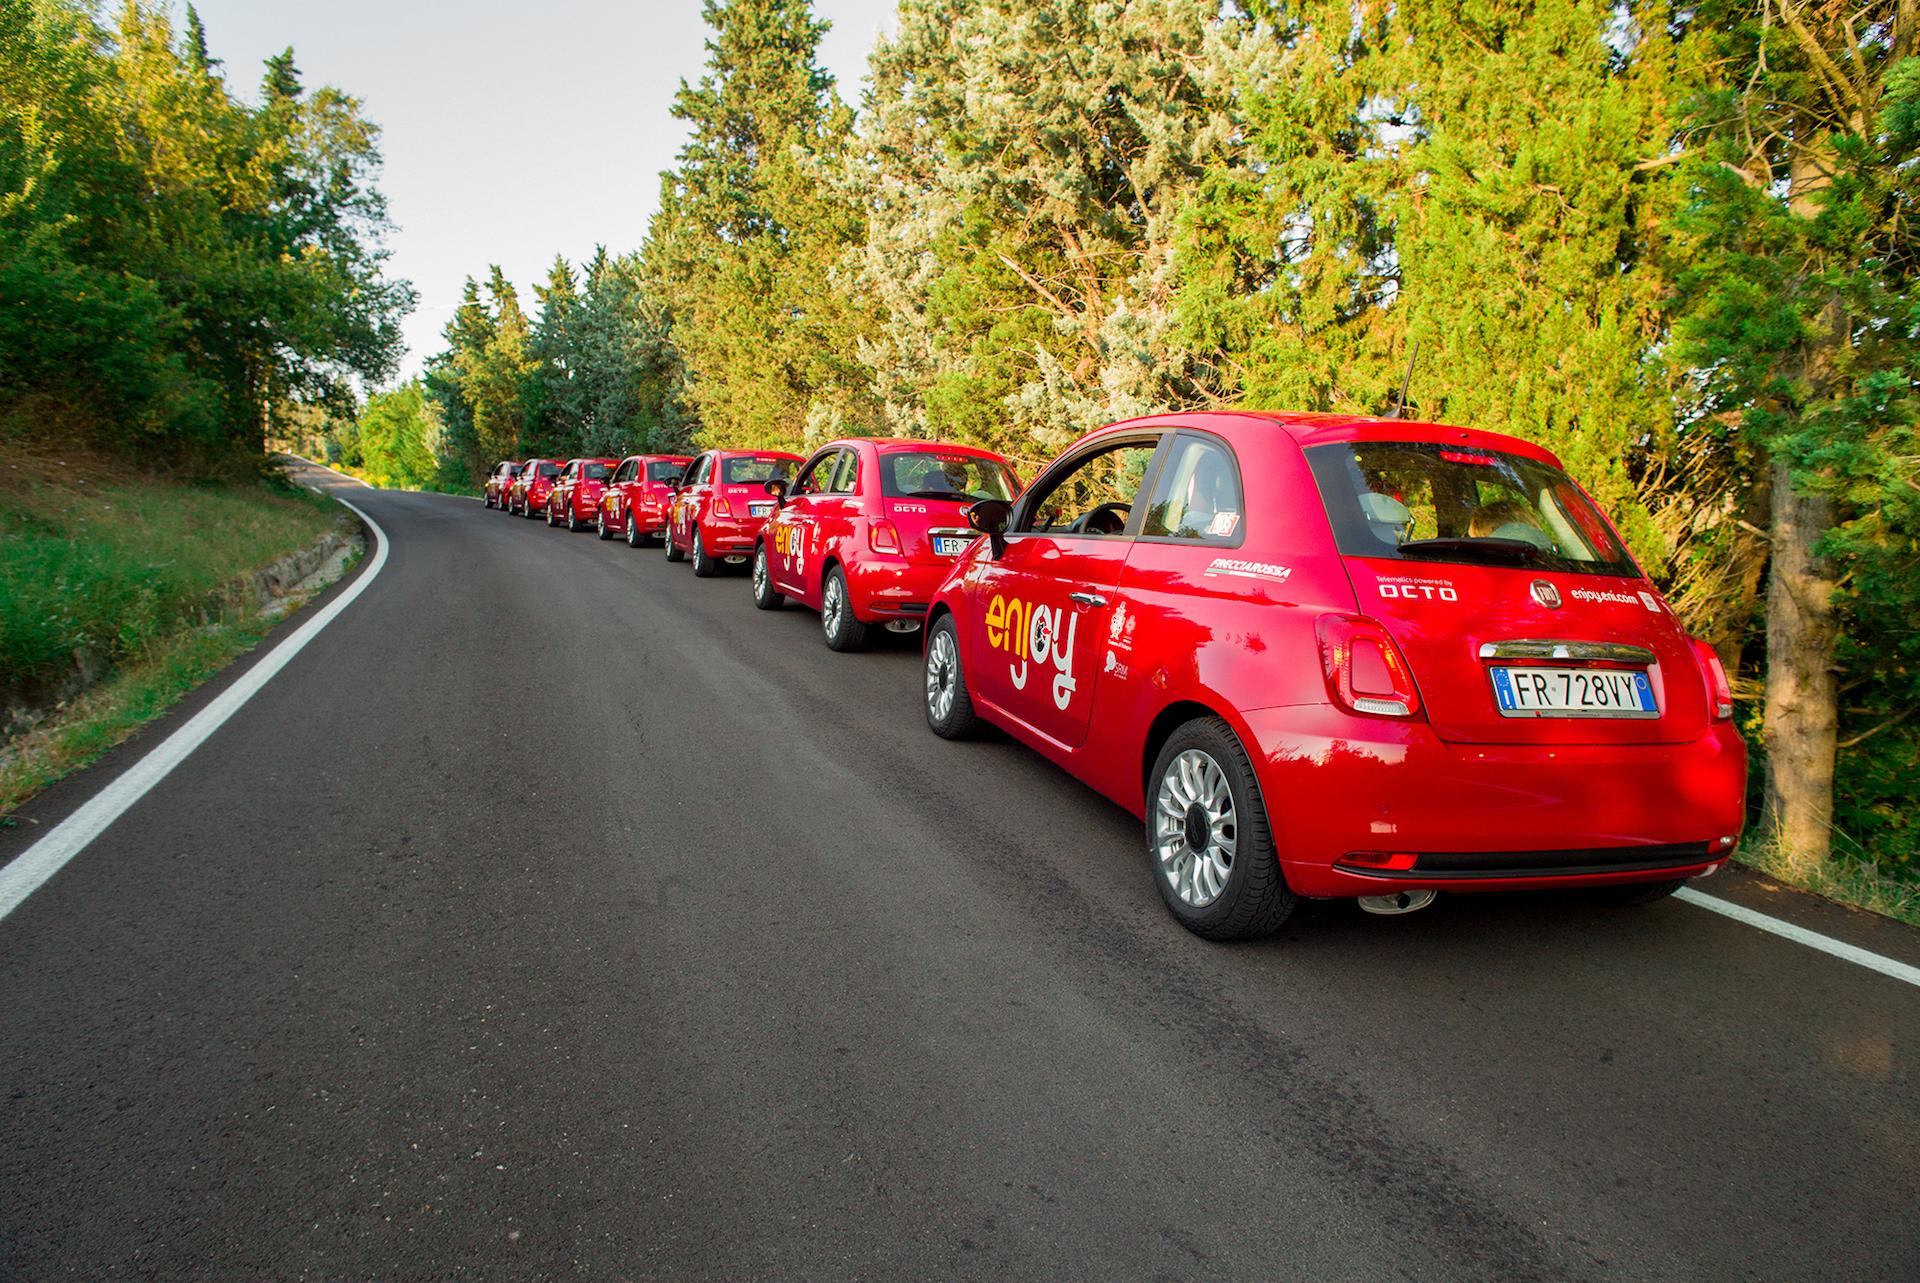 Flotta Enjoy il car sharing di Eni